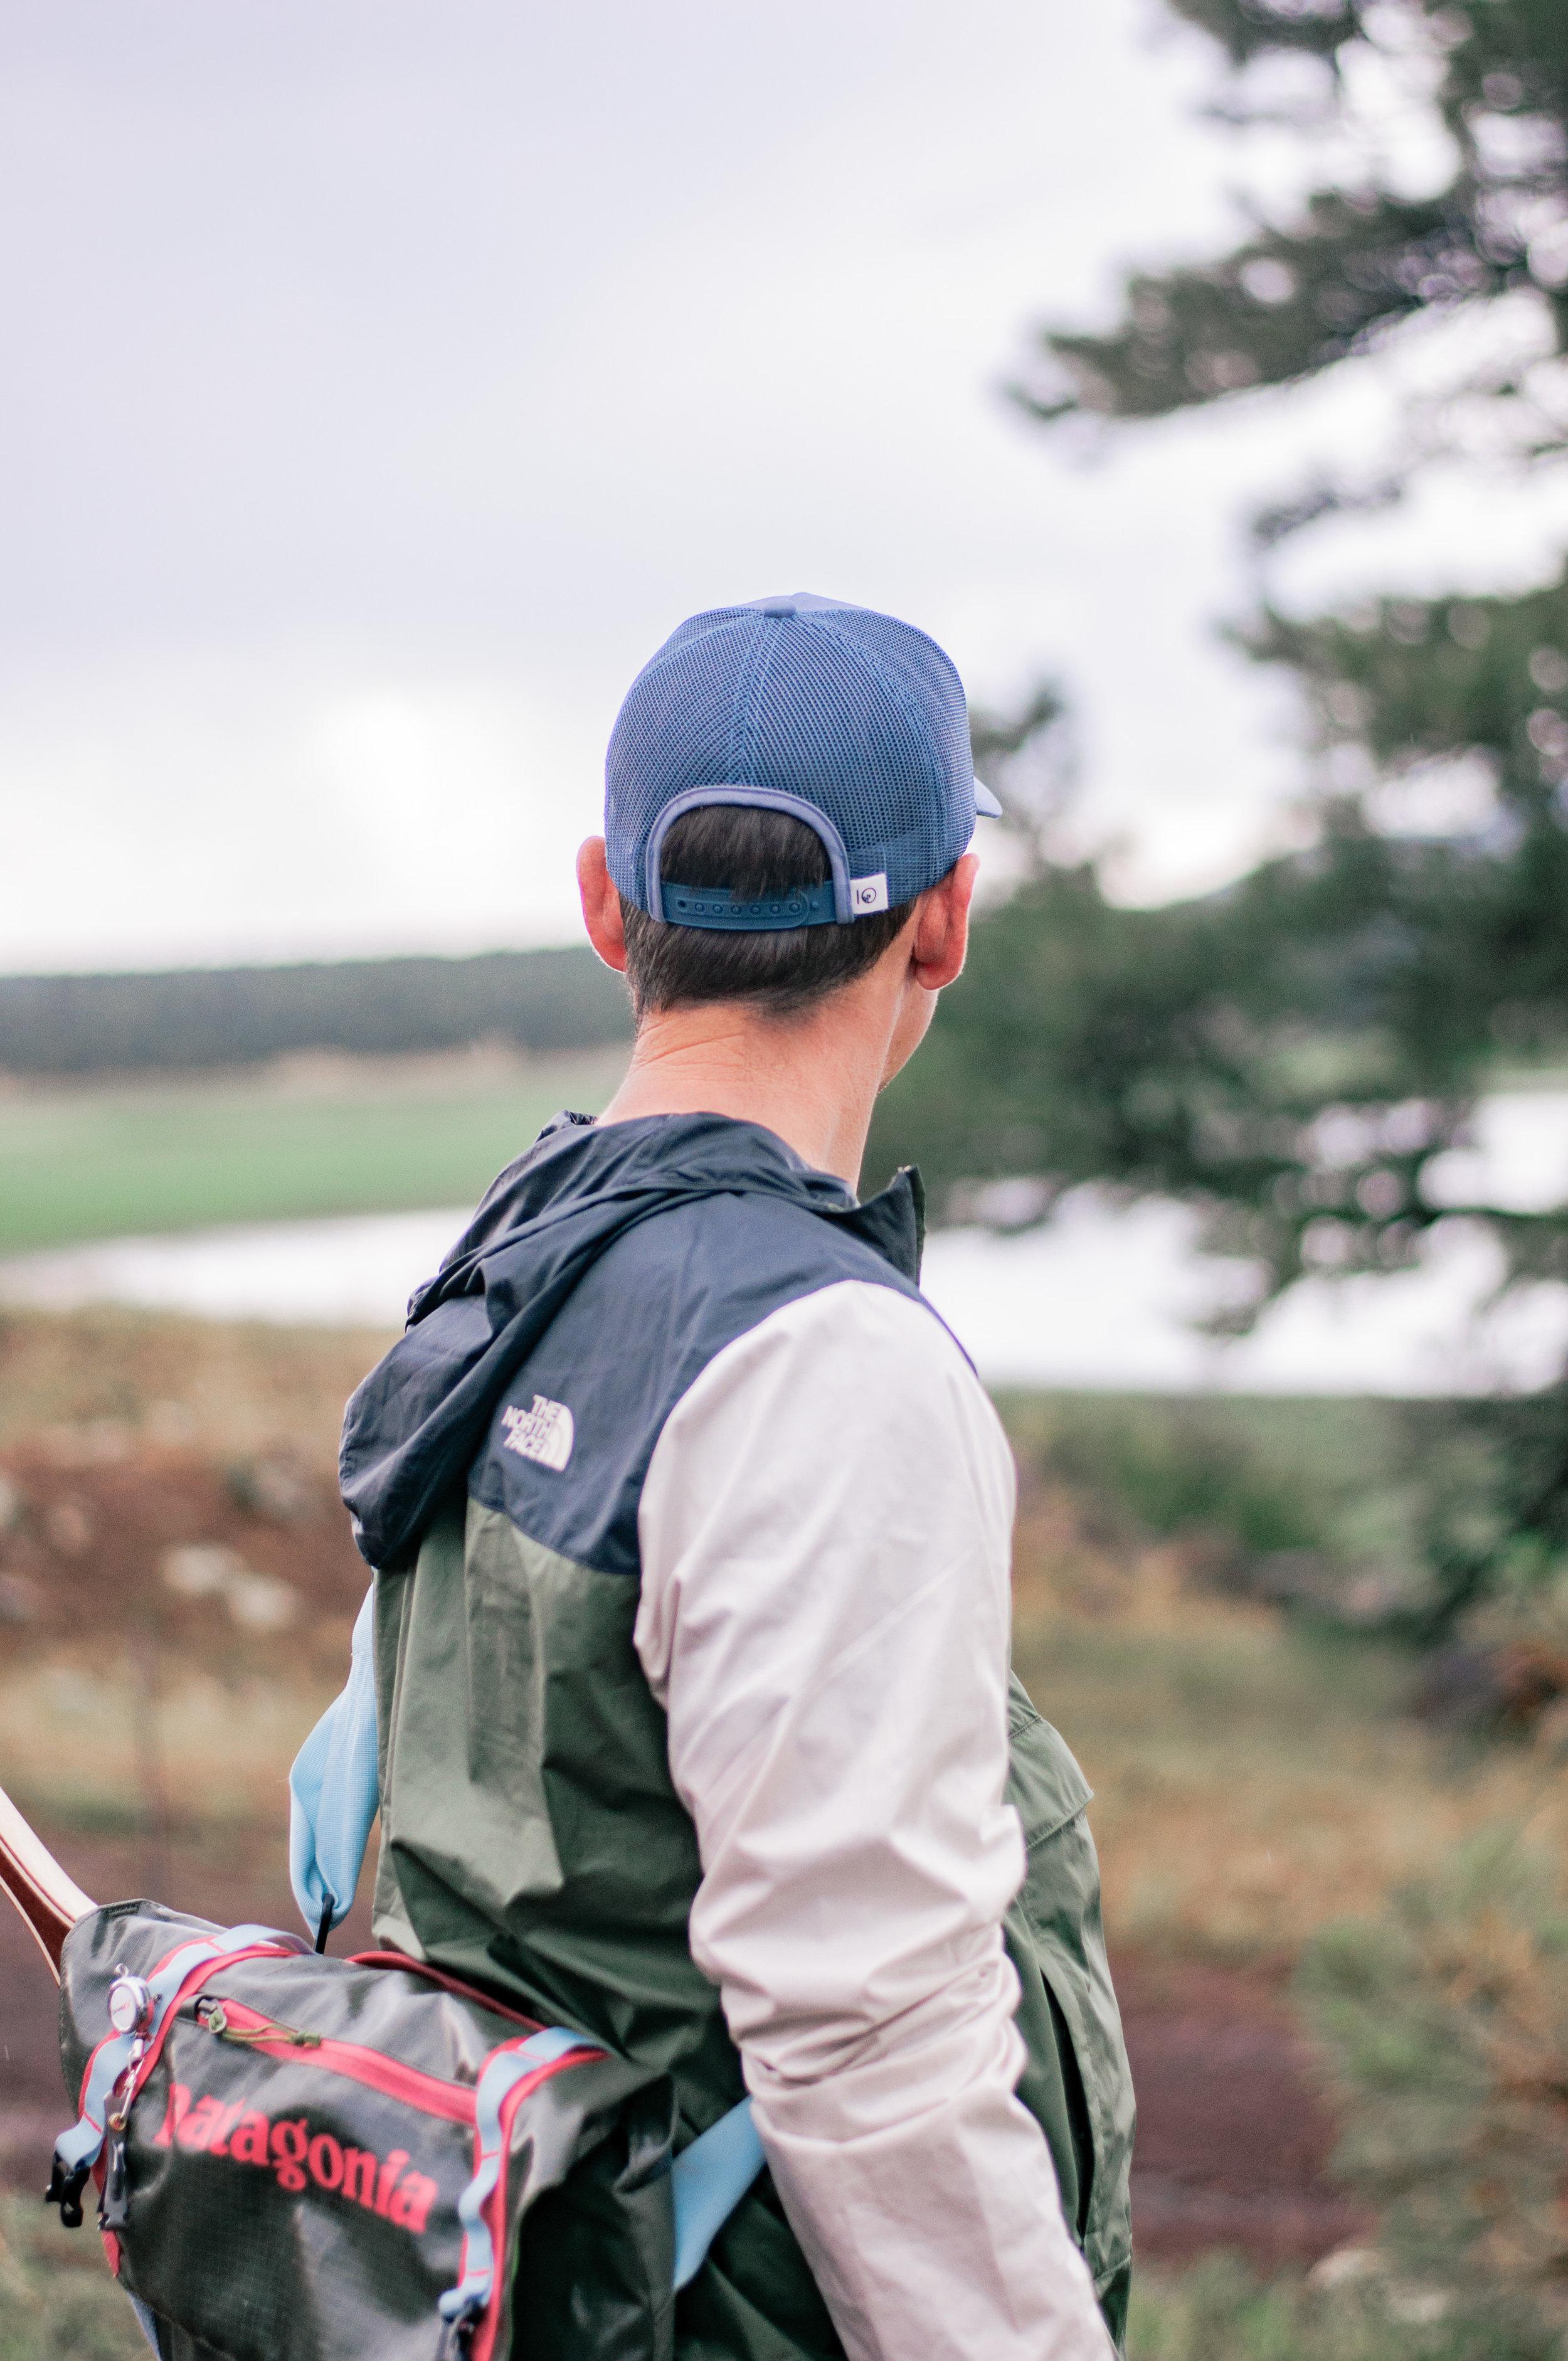 Men's Outdoor Adventure Survival Clothing